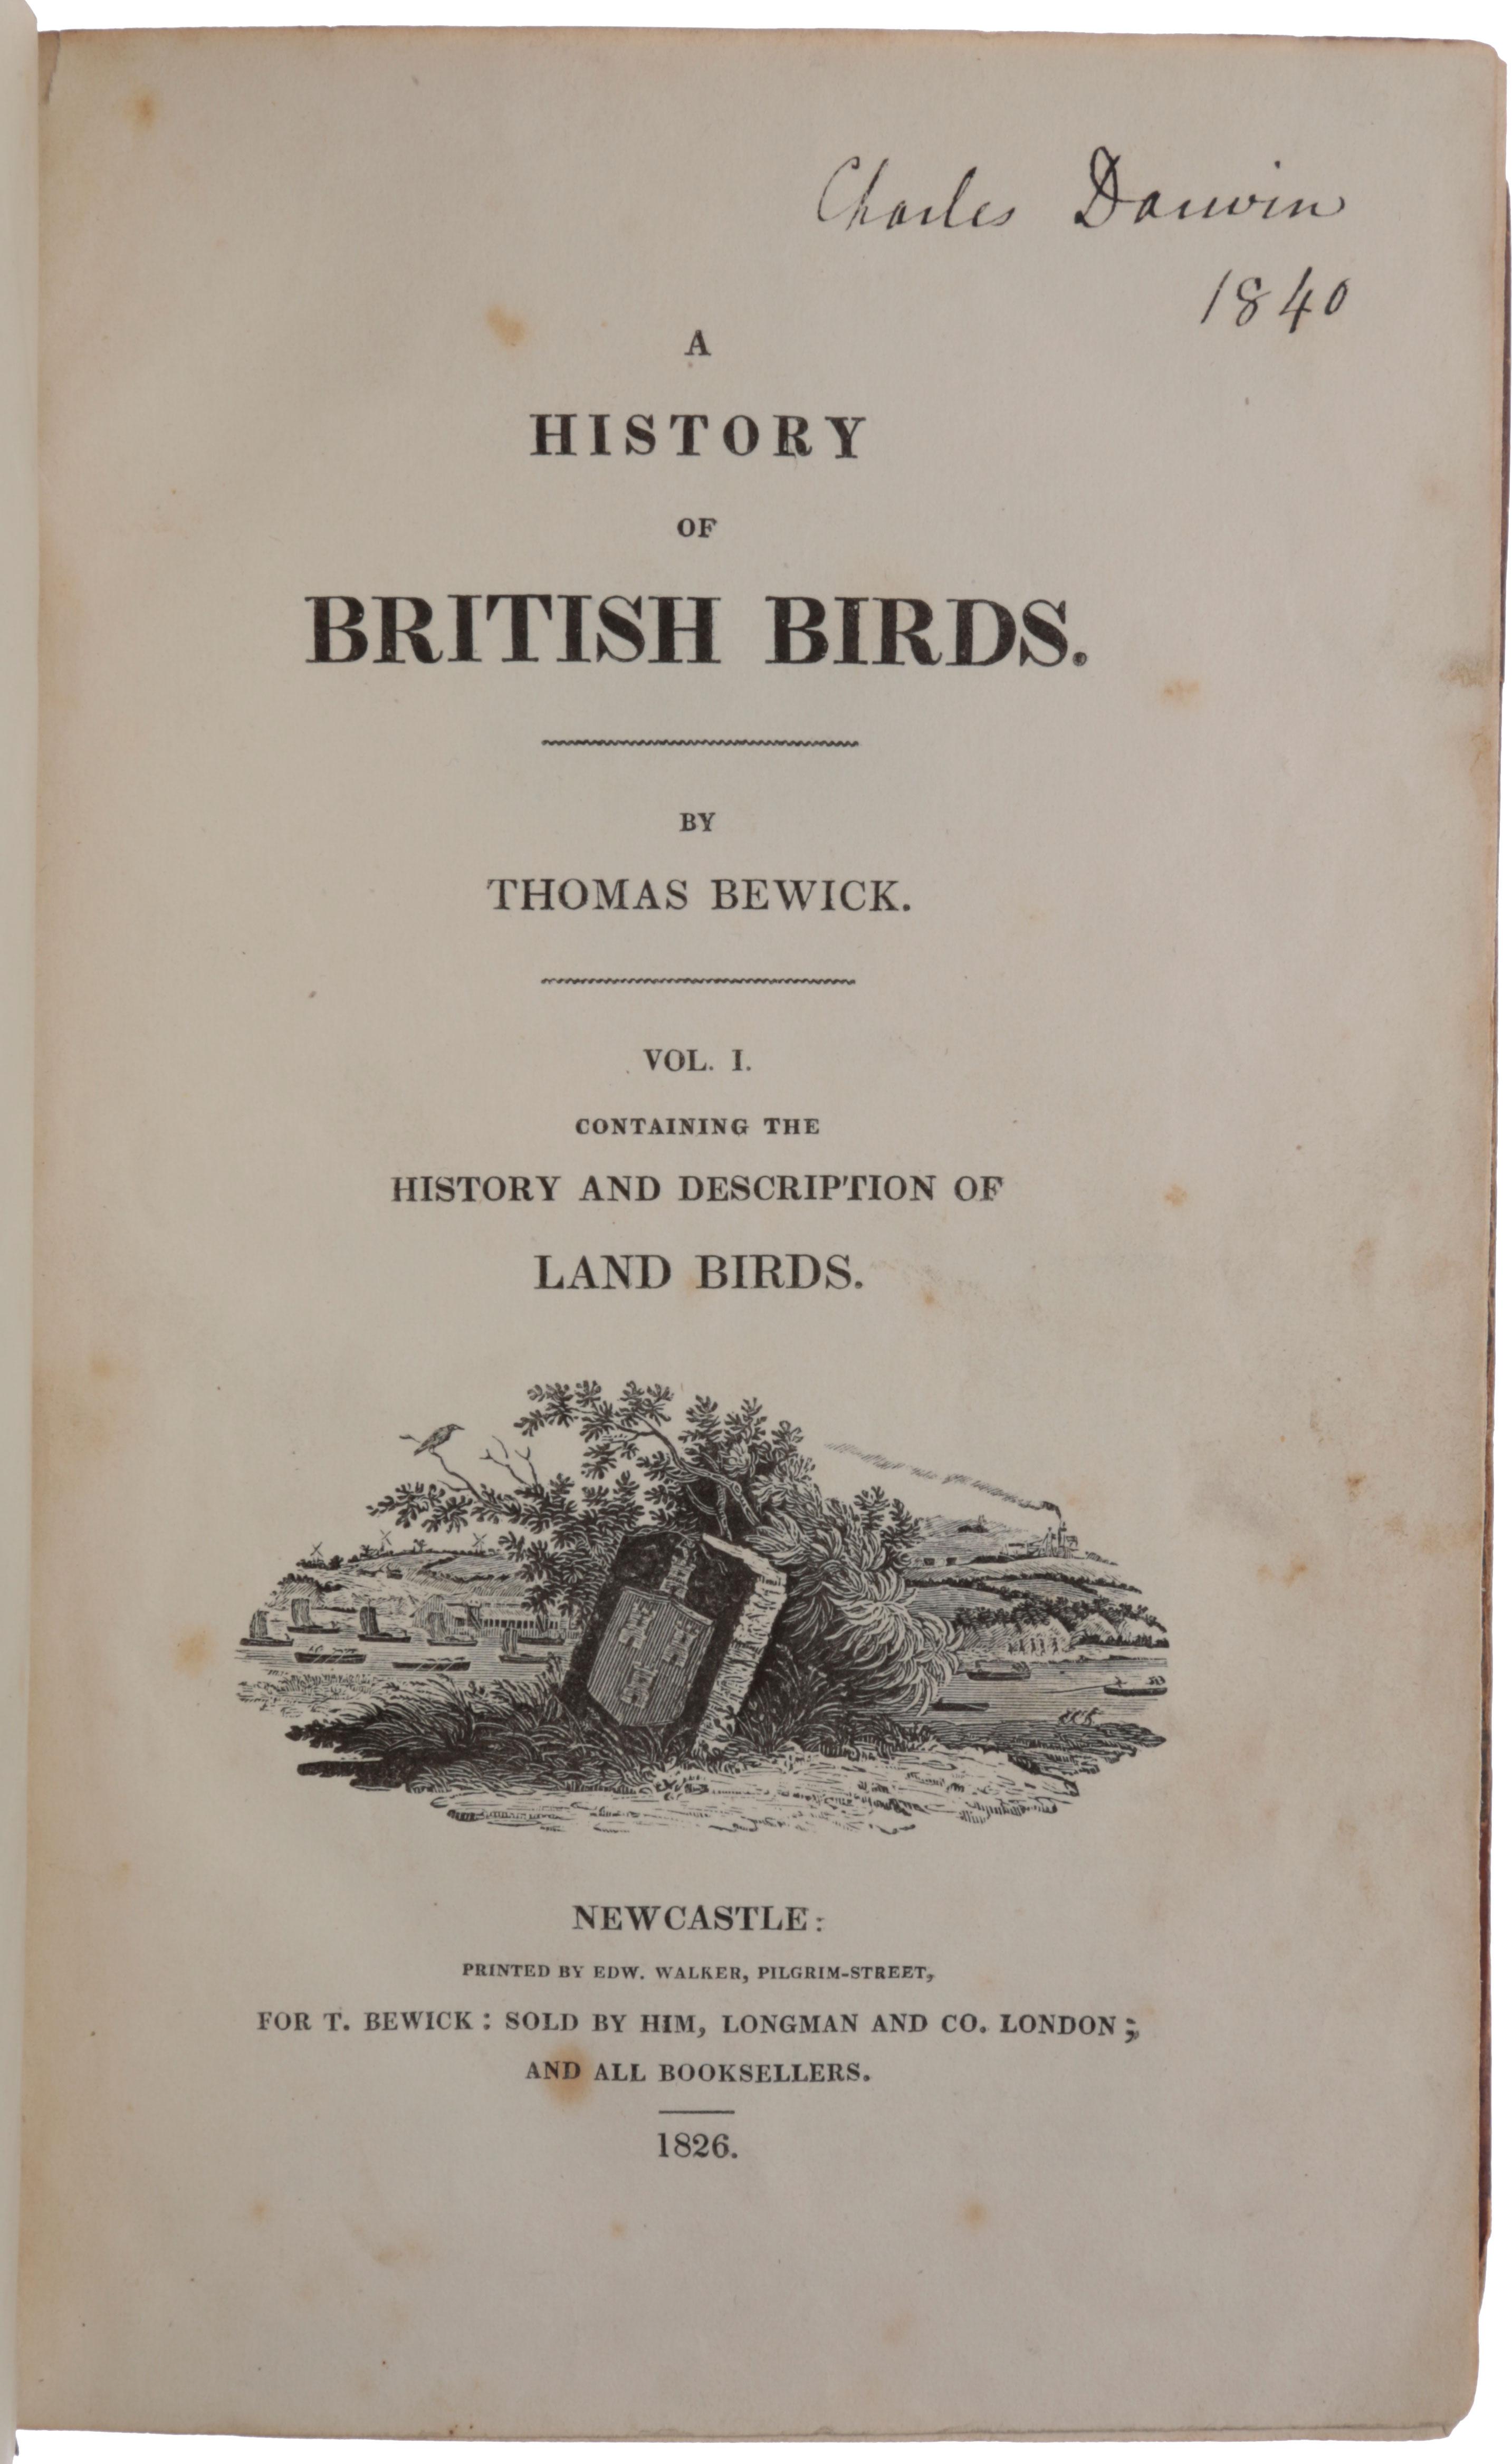 A History of British Birds. Vol. I,: DARWIN, Charles.] BEWICK,